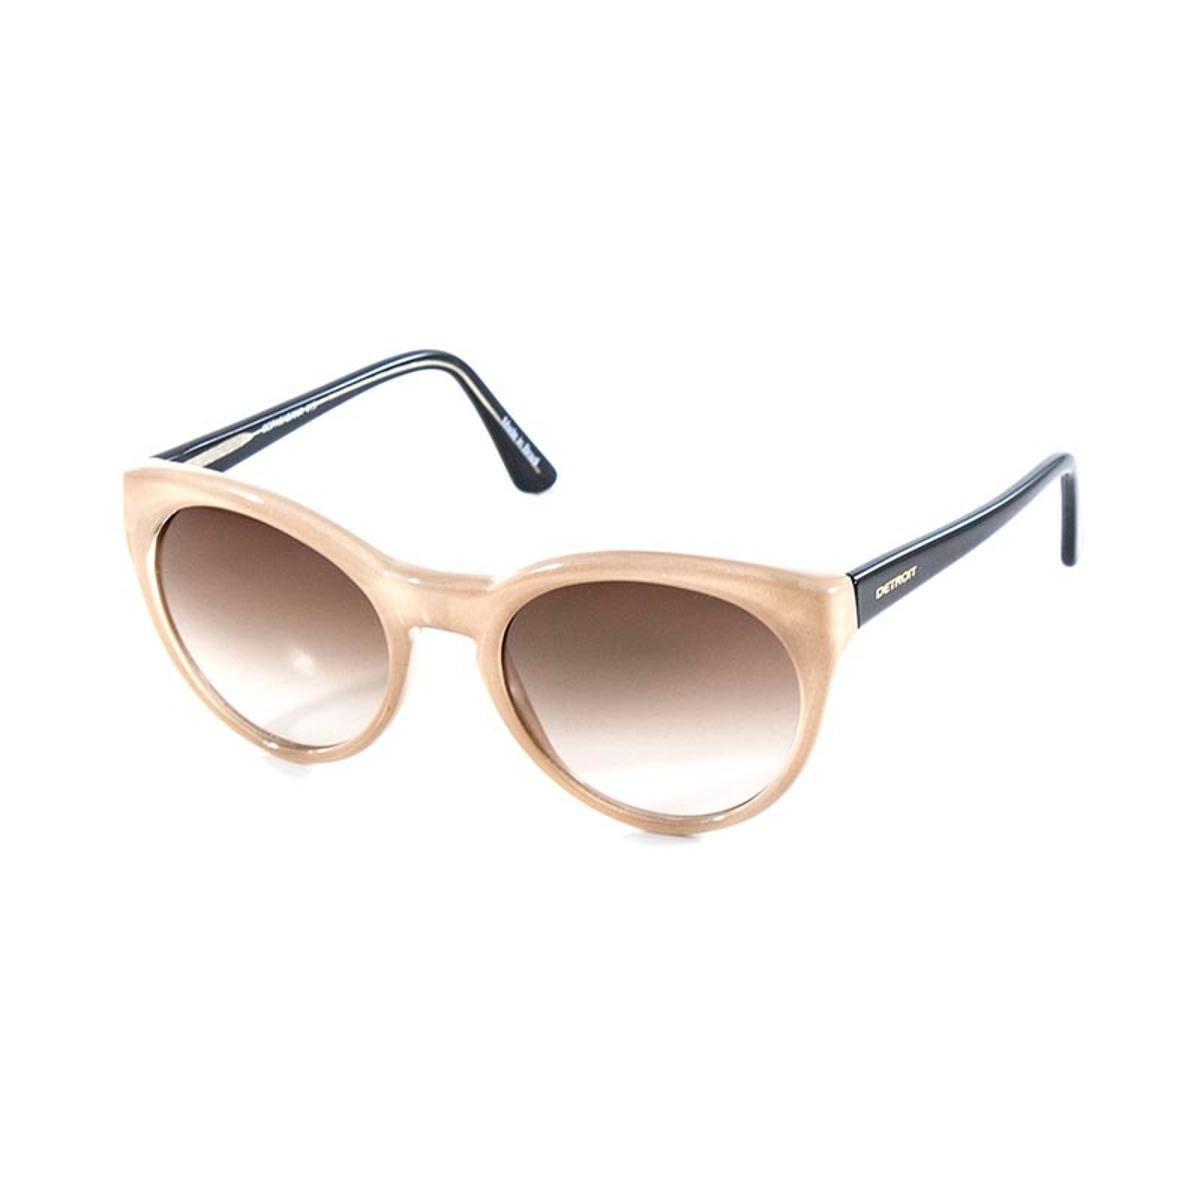 d71a3a83d26e2 Óculos de Sol Detroit Copacabana - Compre Agora   Zattini